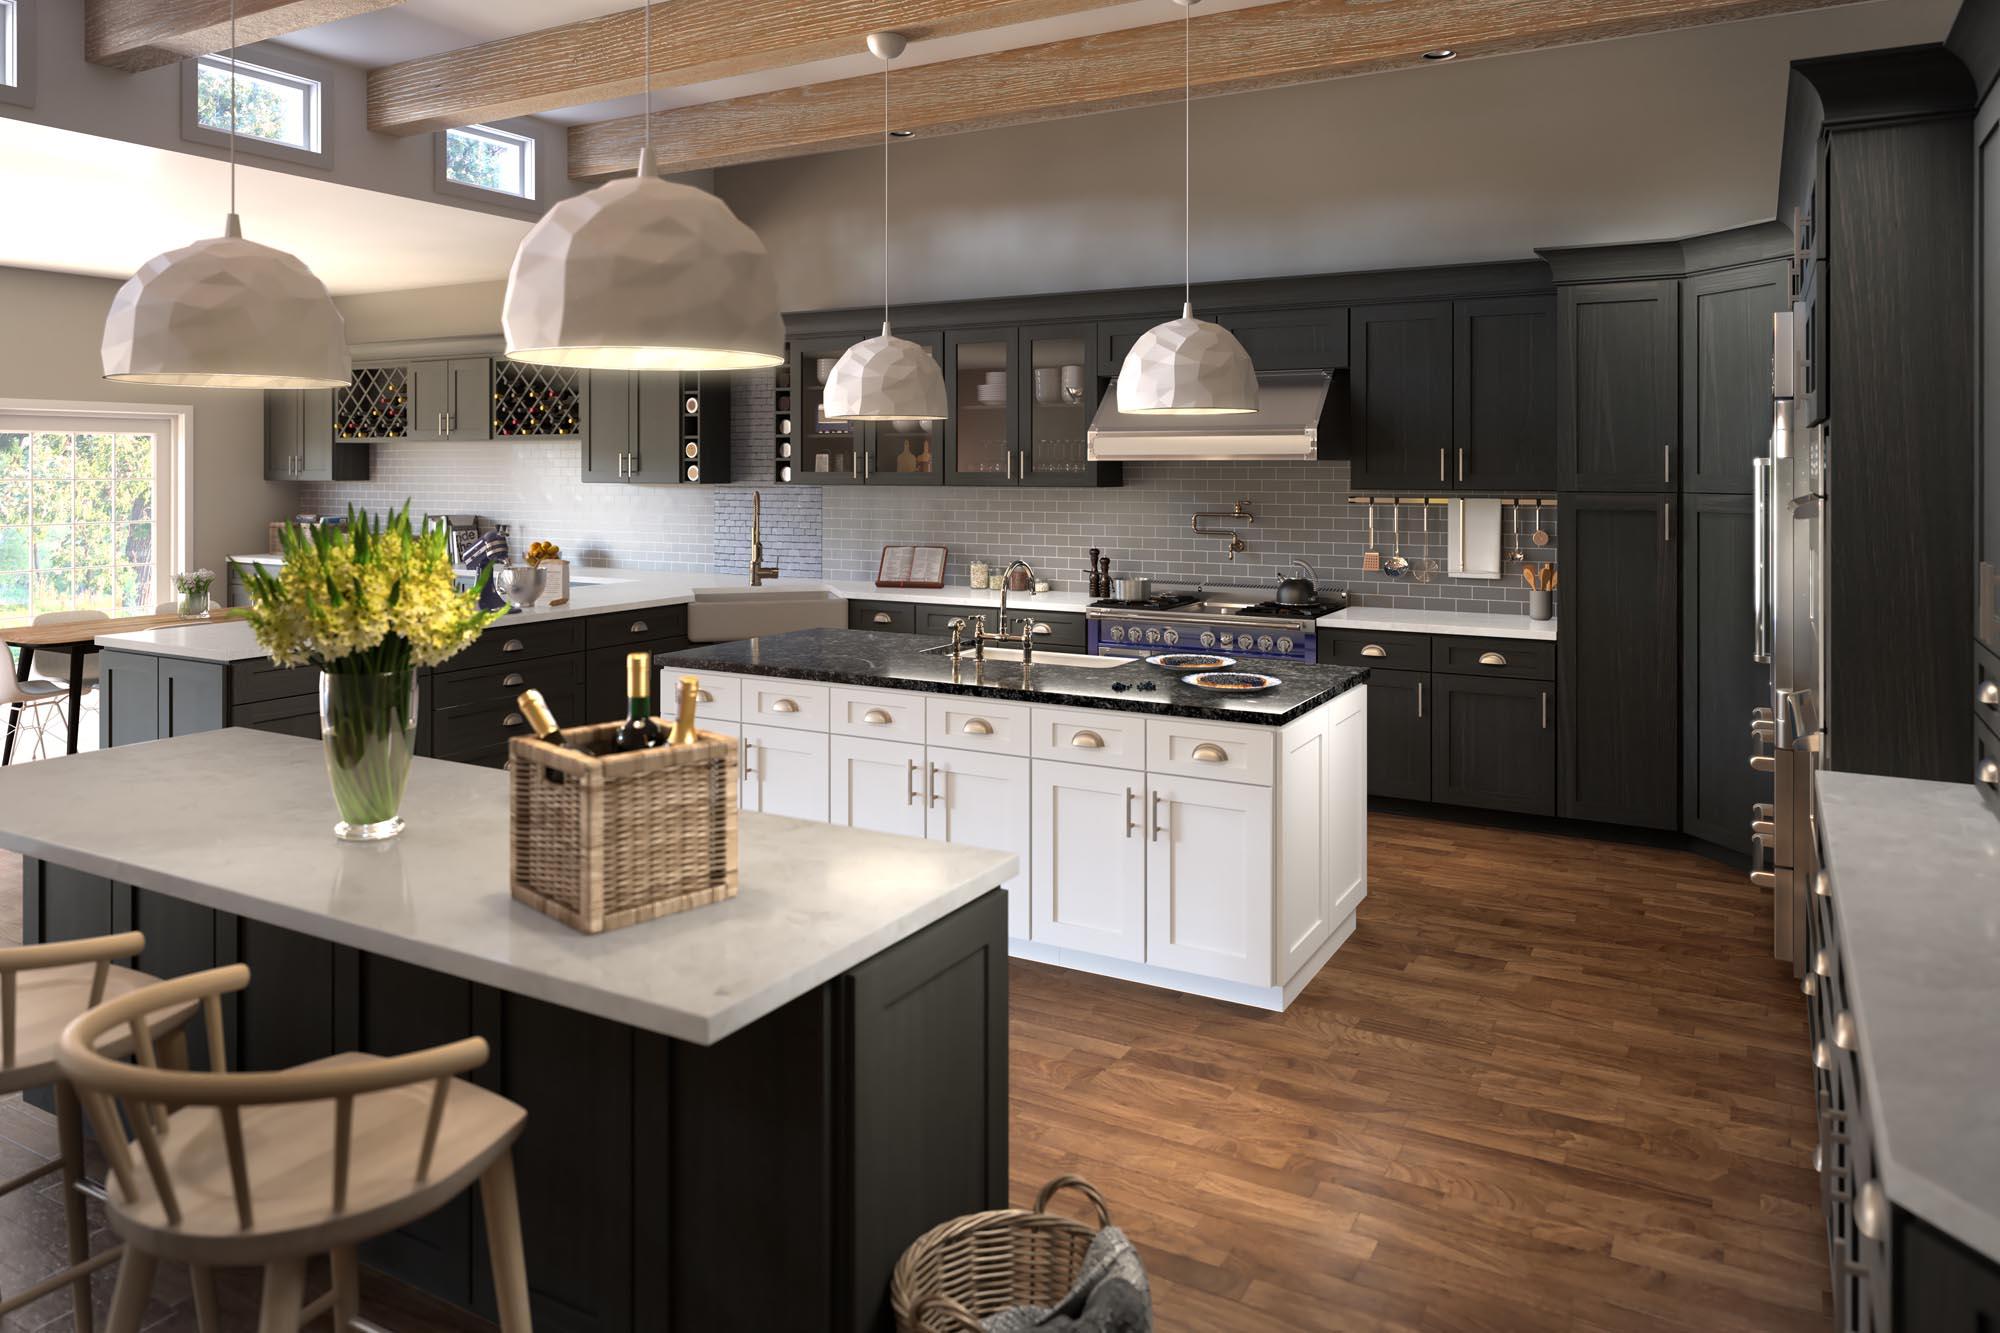 gray_kitchen_cabinets_cgi_rendering_2